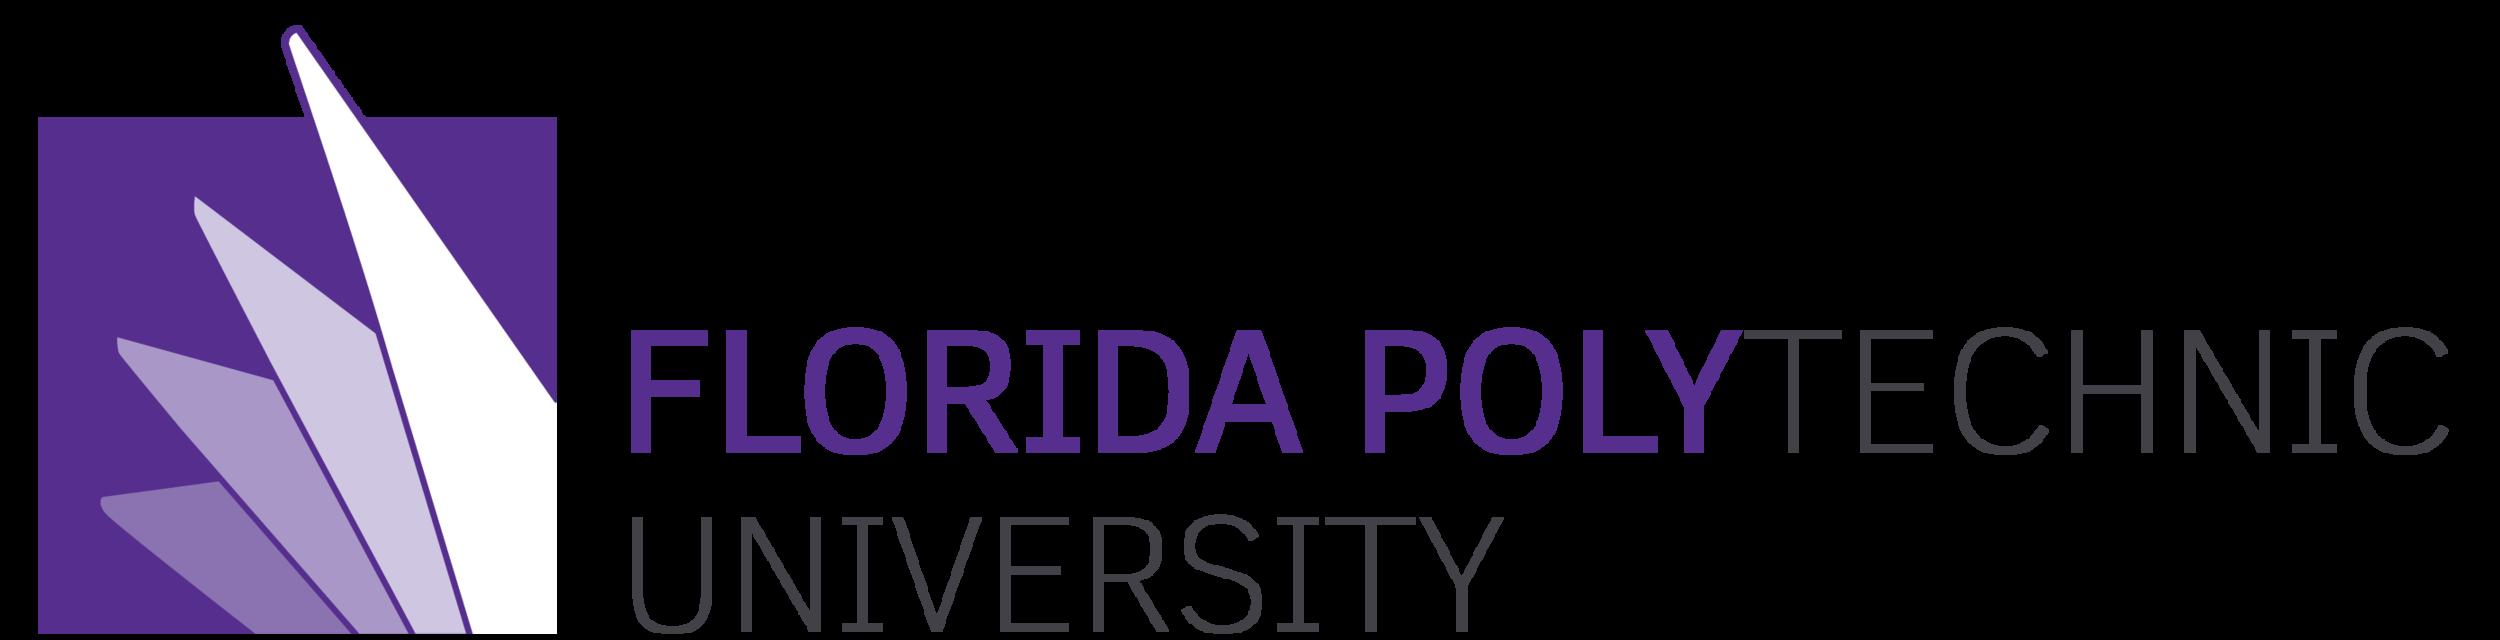 Florida Polytechnic.png